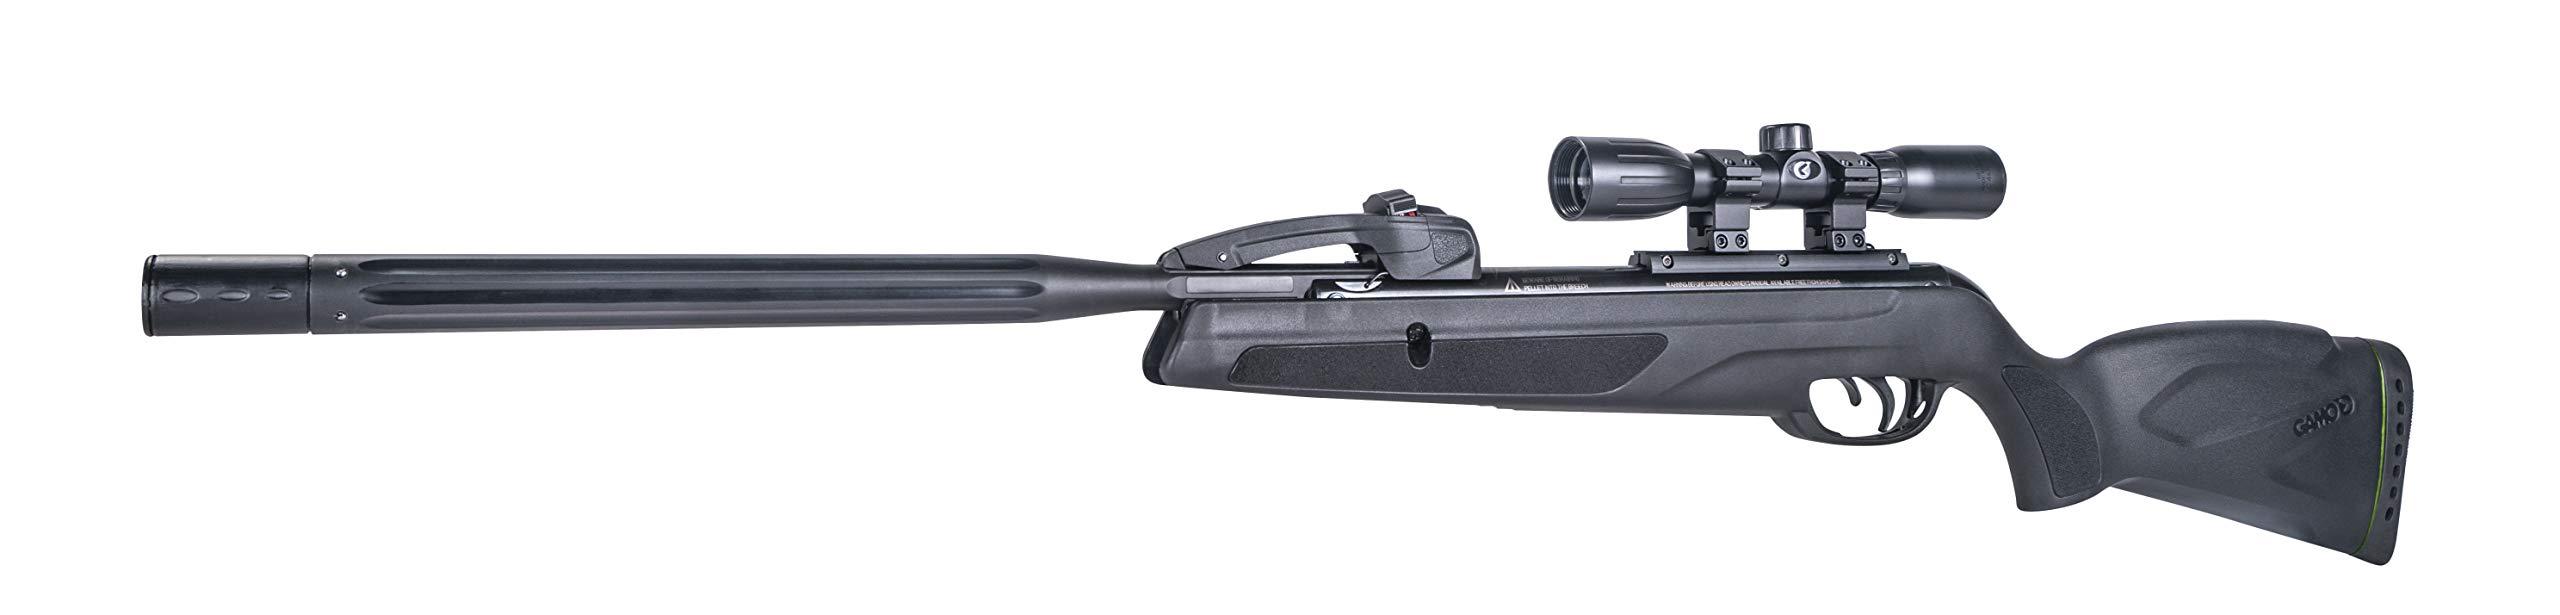 Gamo 611006875554 Swarm Whisper Air Rifle, .22 Caliber by Gamo